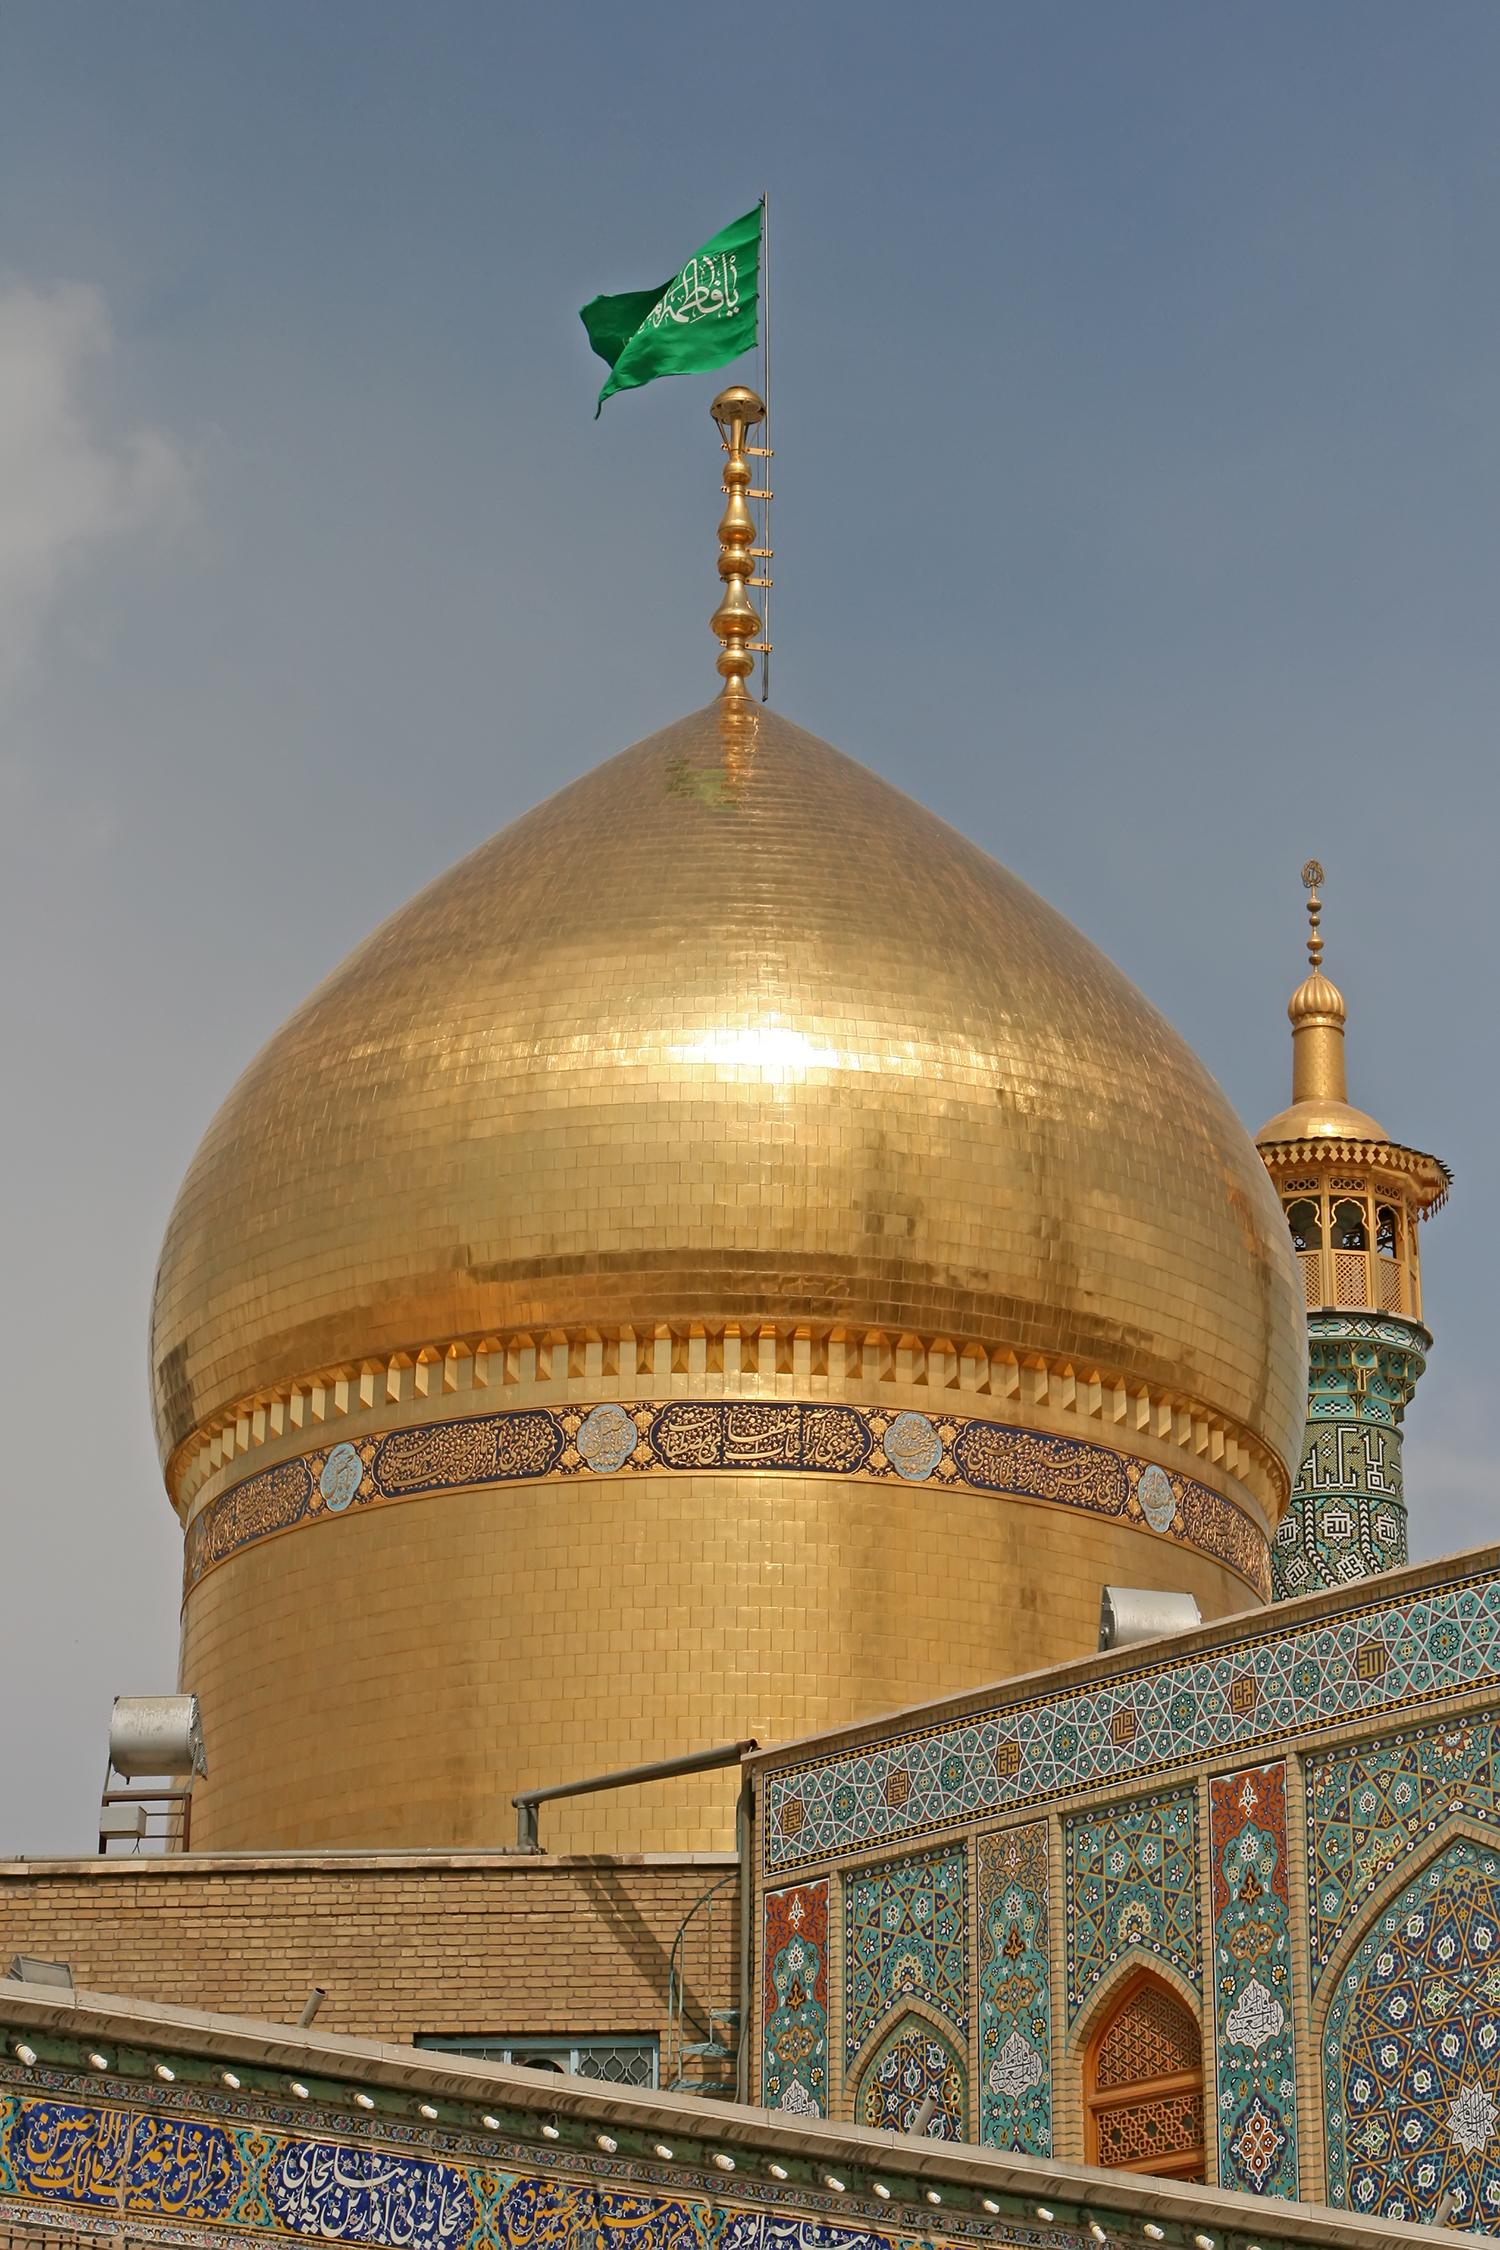 Visiting the Shrineedit Fatima Masumeh Shrine